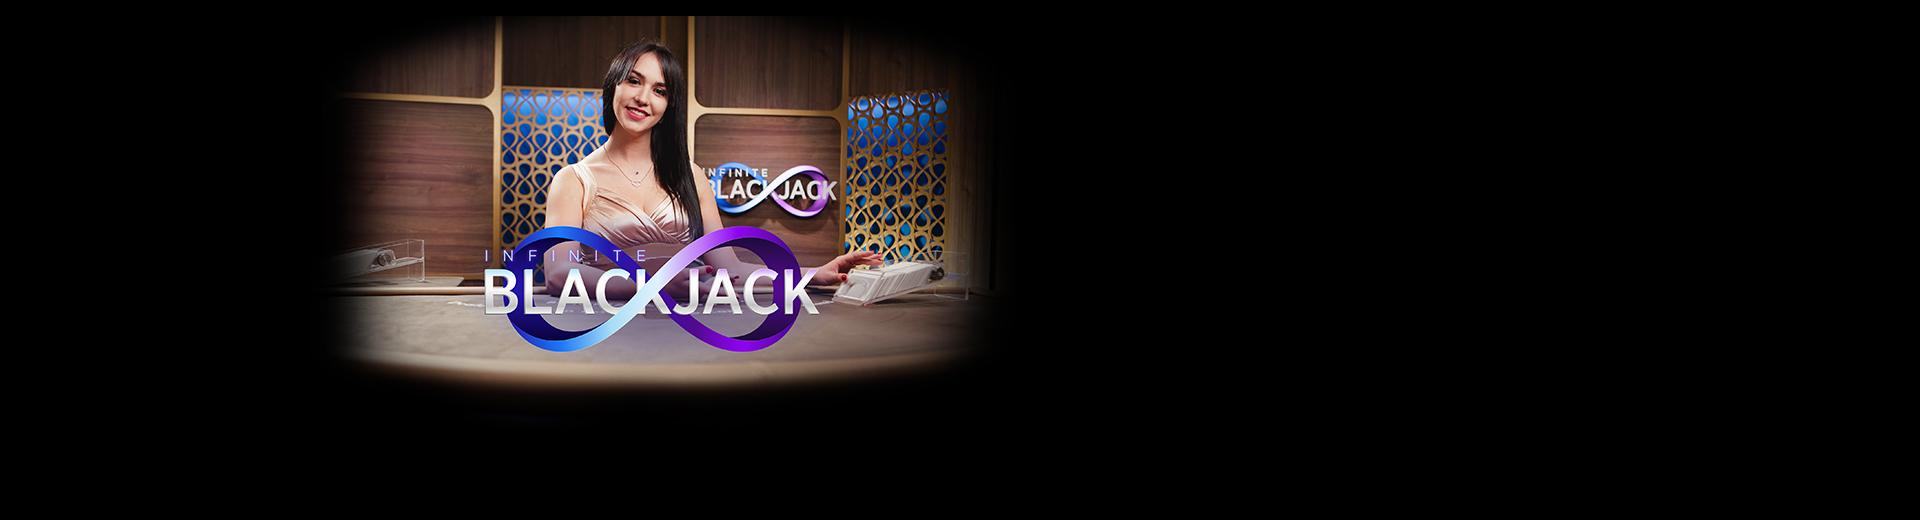 C10-1920x5202340_2018_Infinite Blackjack - Evolution